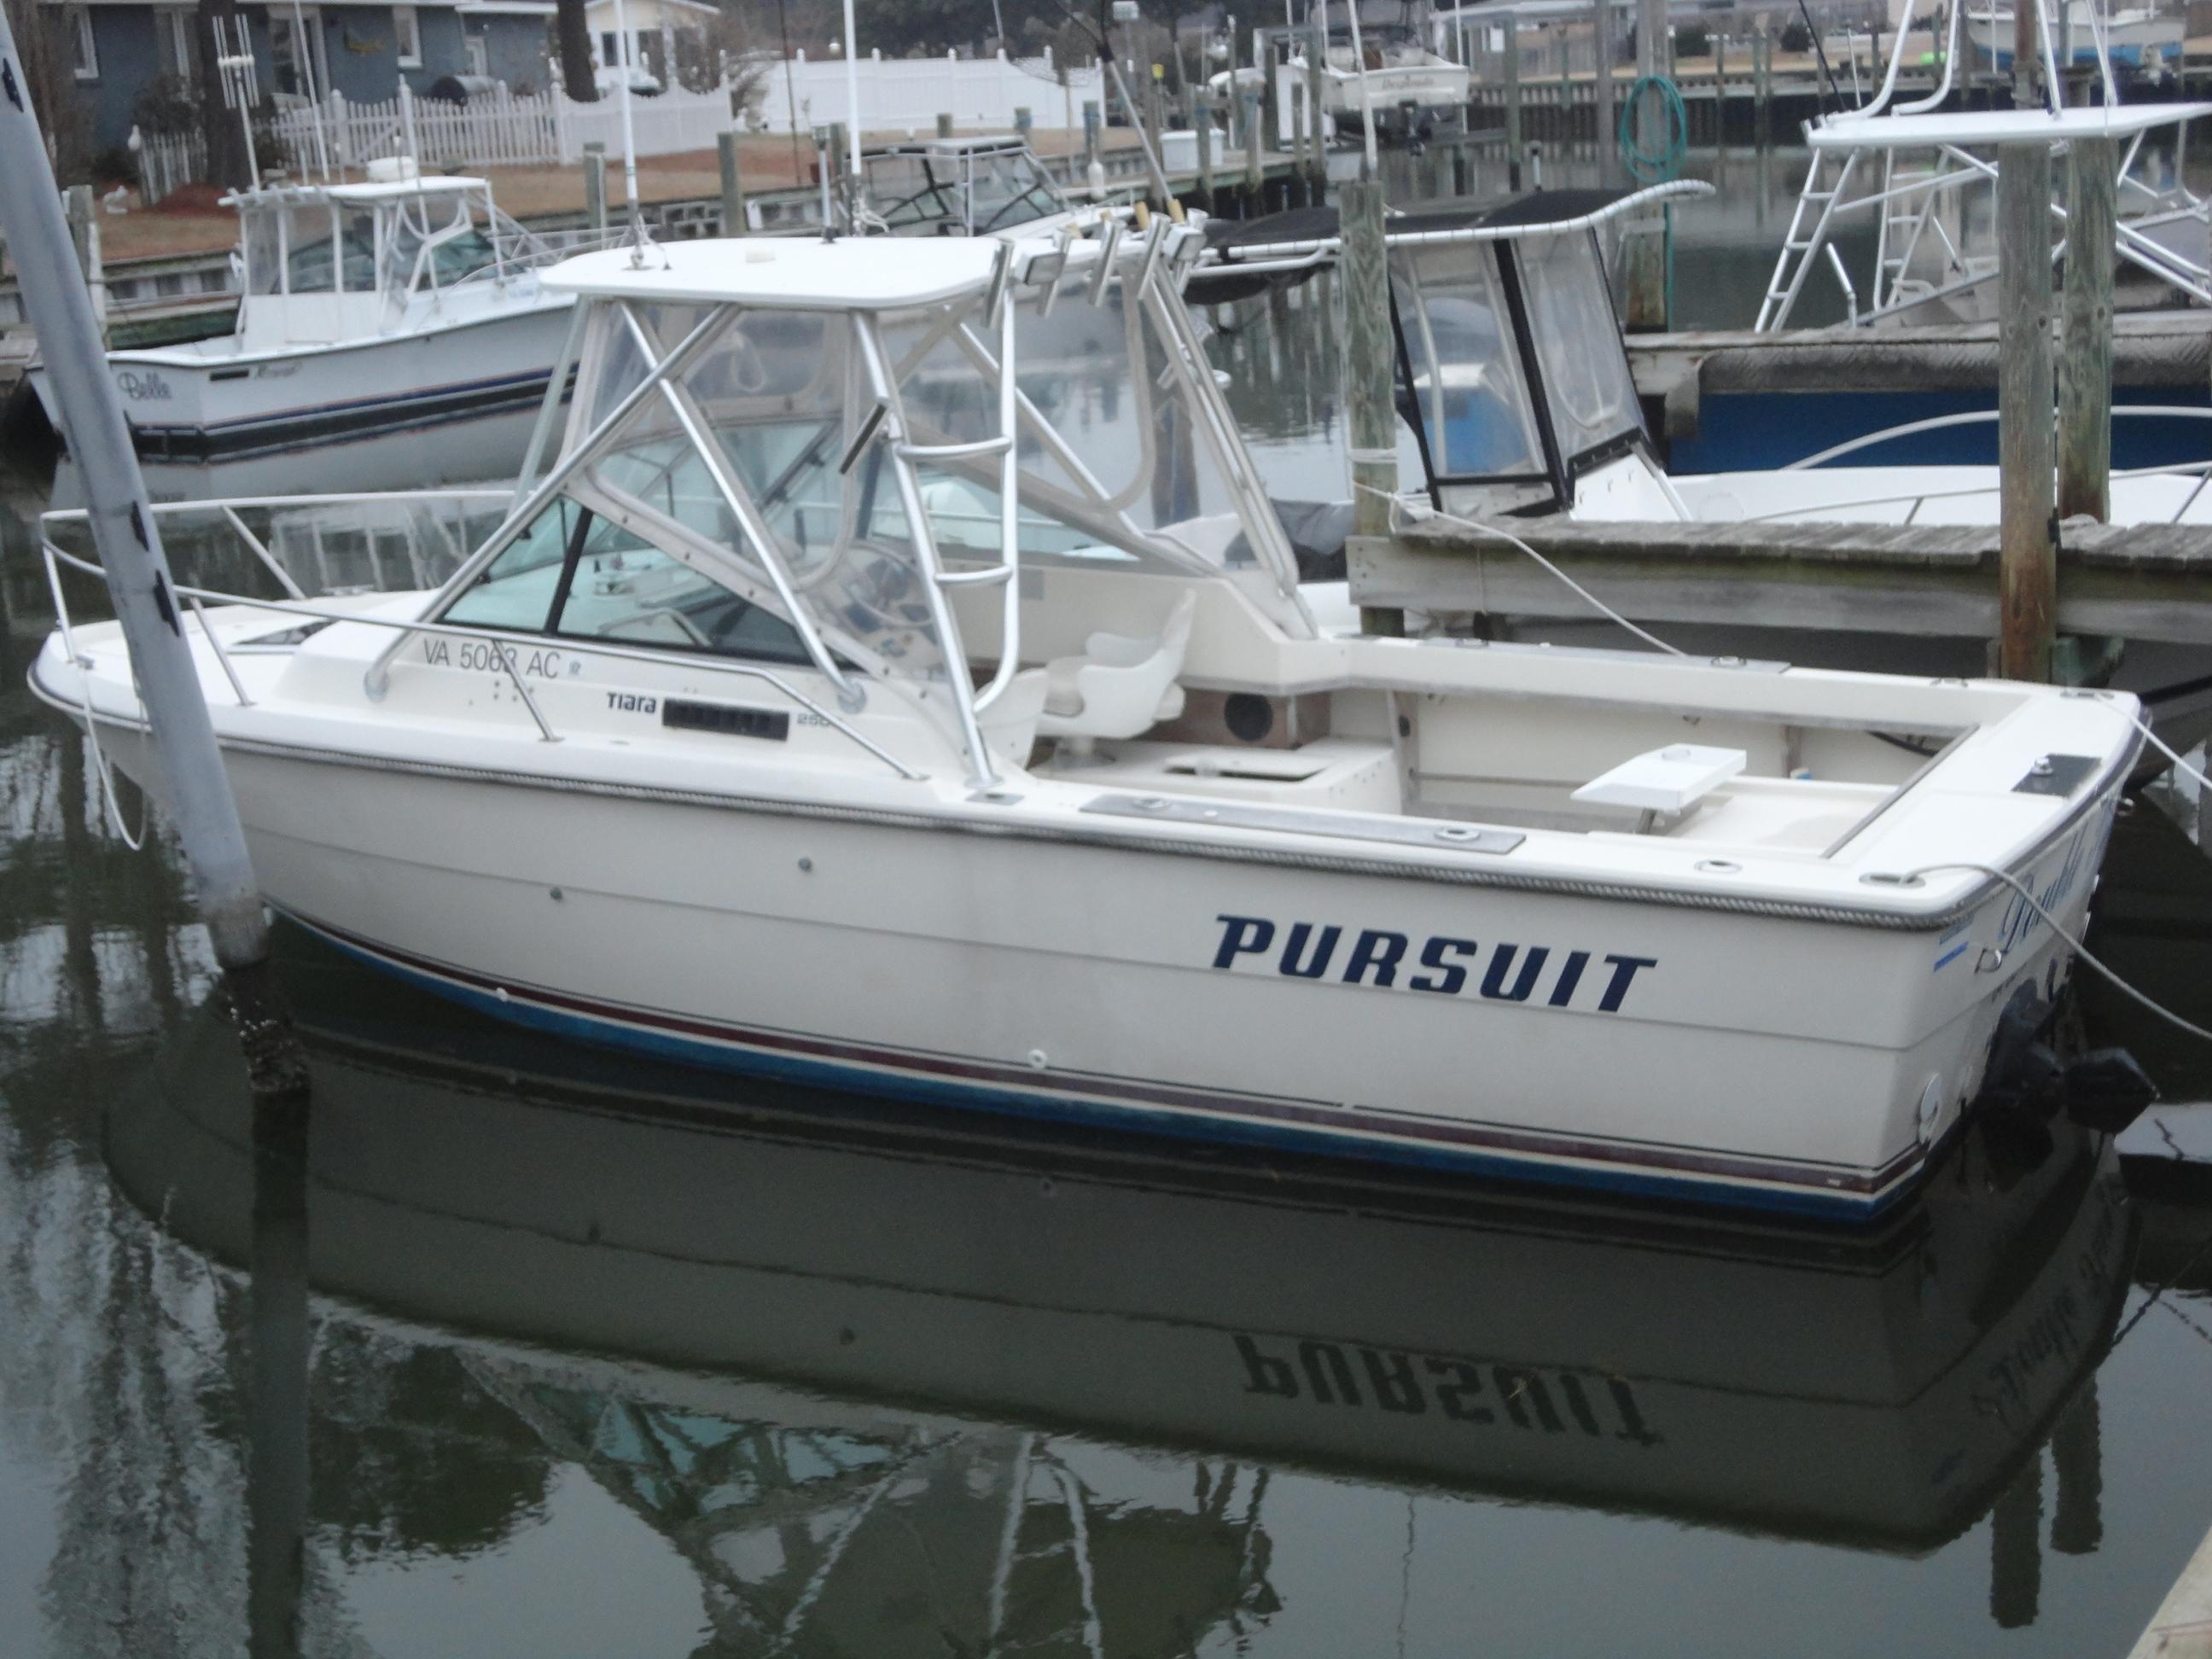 1985 Pursuit 2500 Tiara Power Boat For Sale - www.yachtworld.com